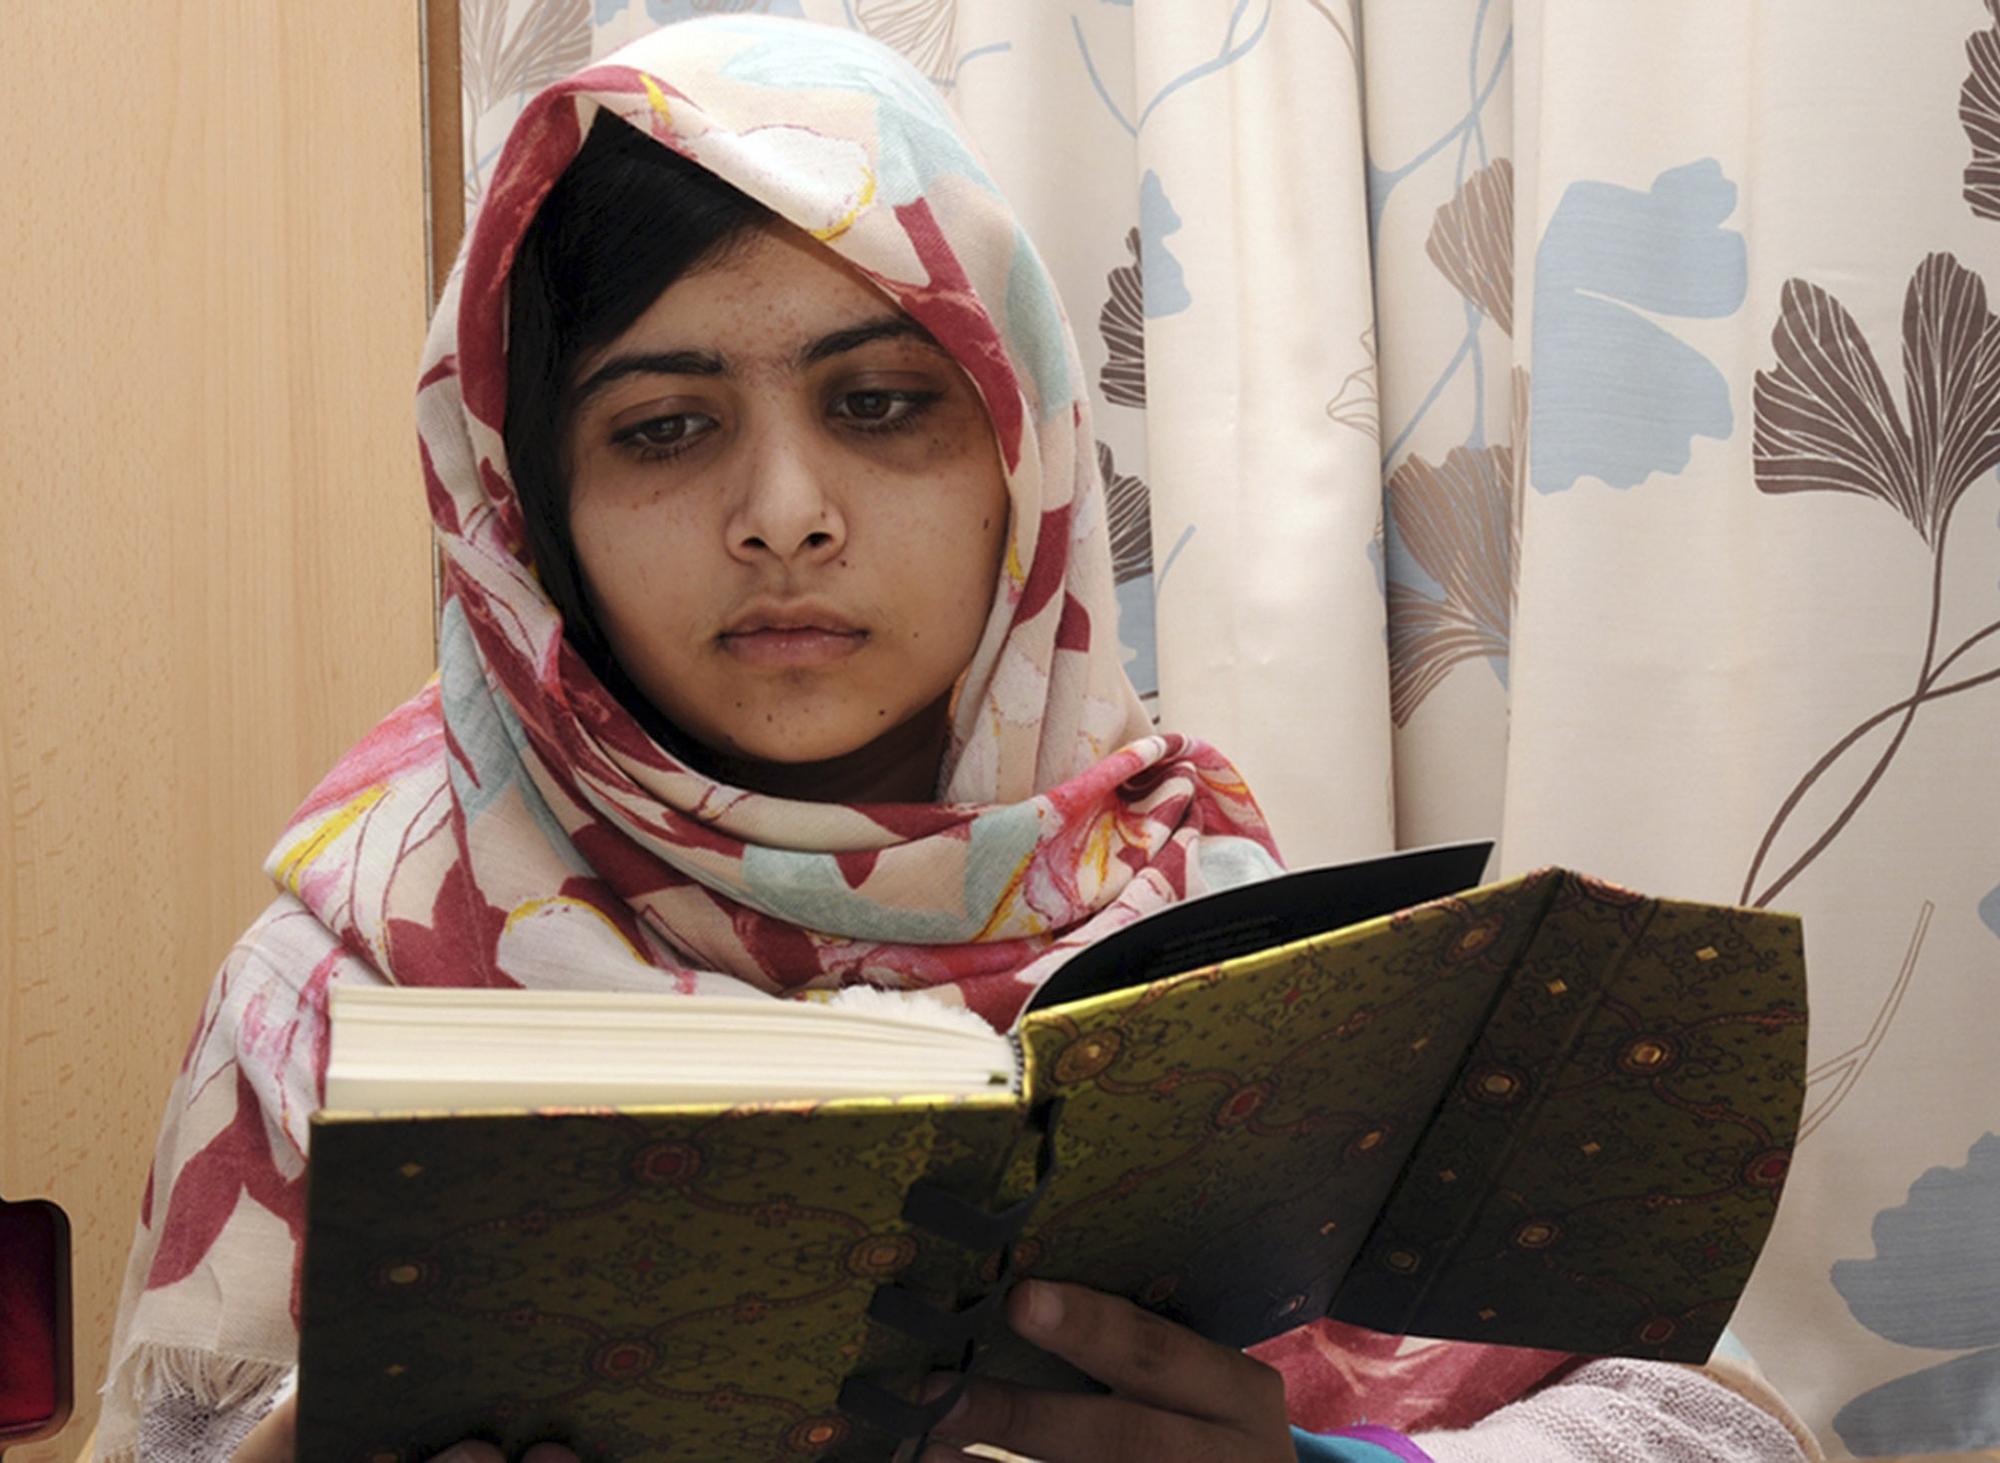 Malala Yousafzai - Bio, News, Photos - Washington Times